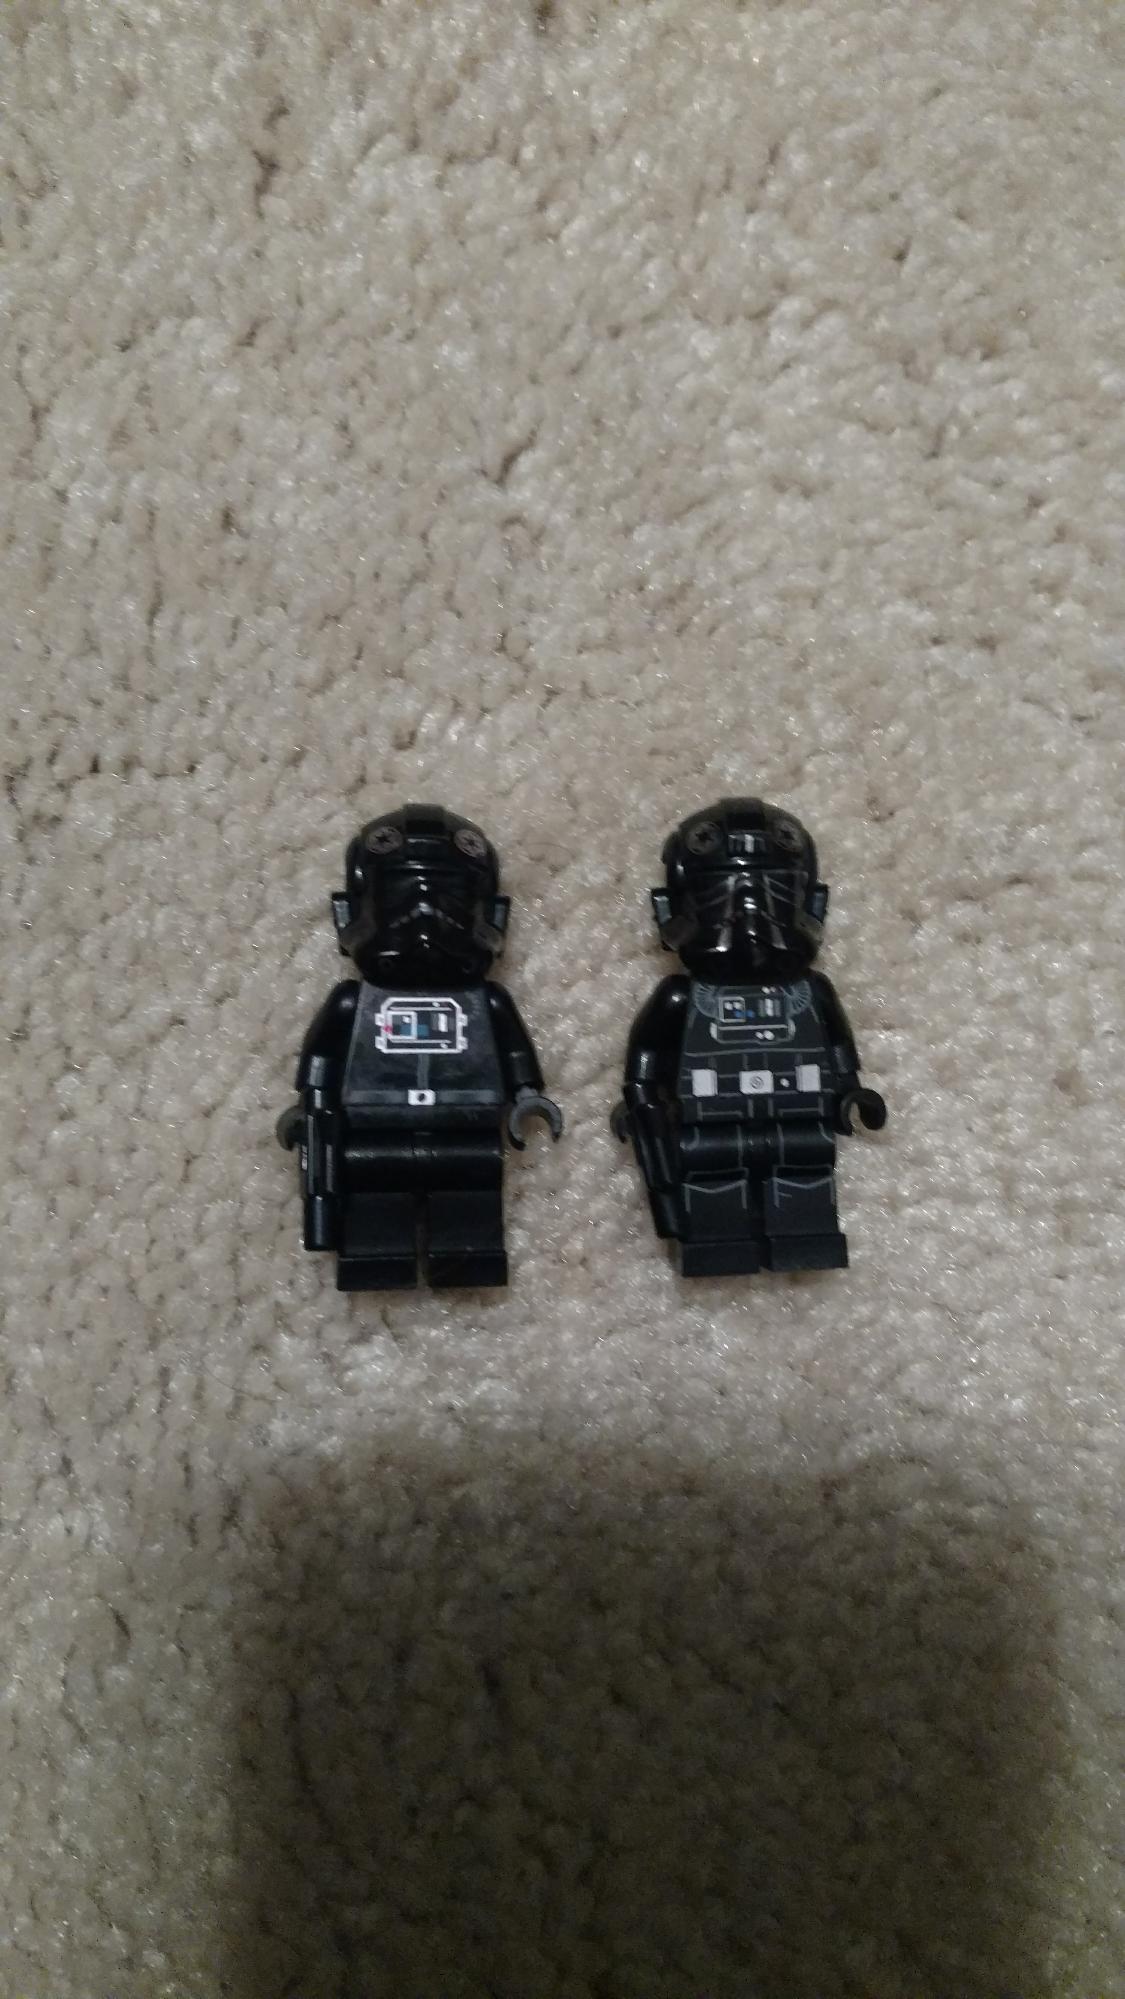 Evolution of the TIE Pilot (LEGO Edition)